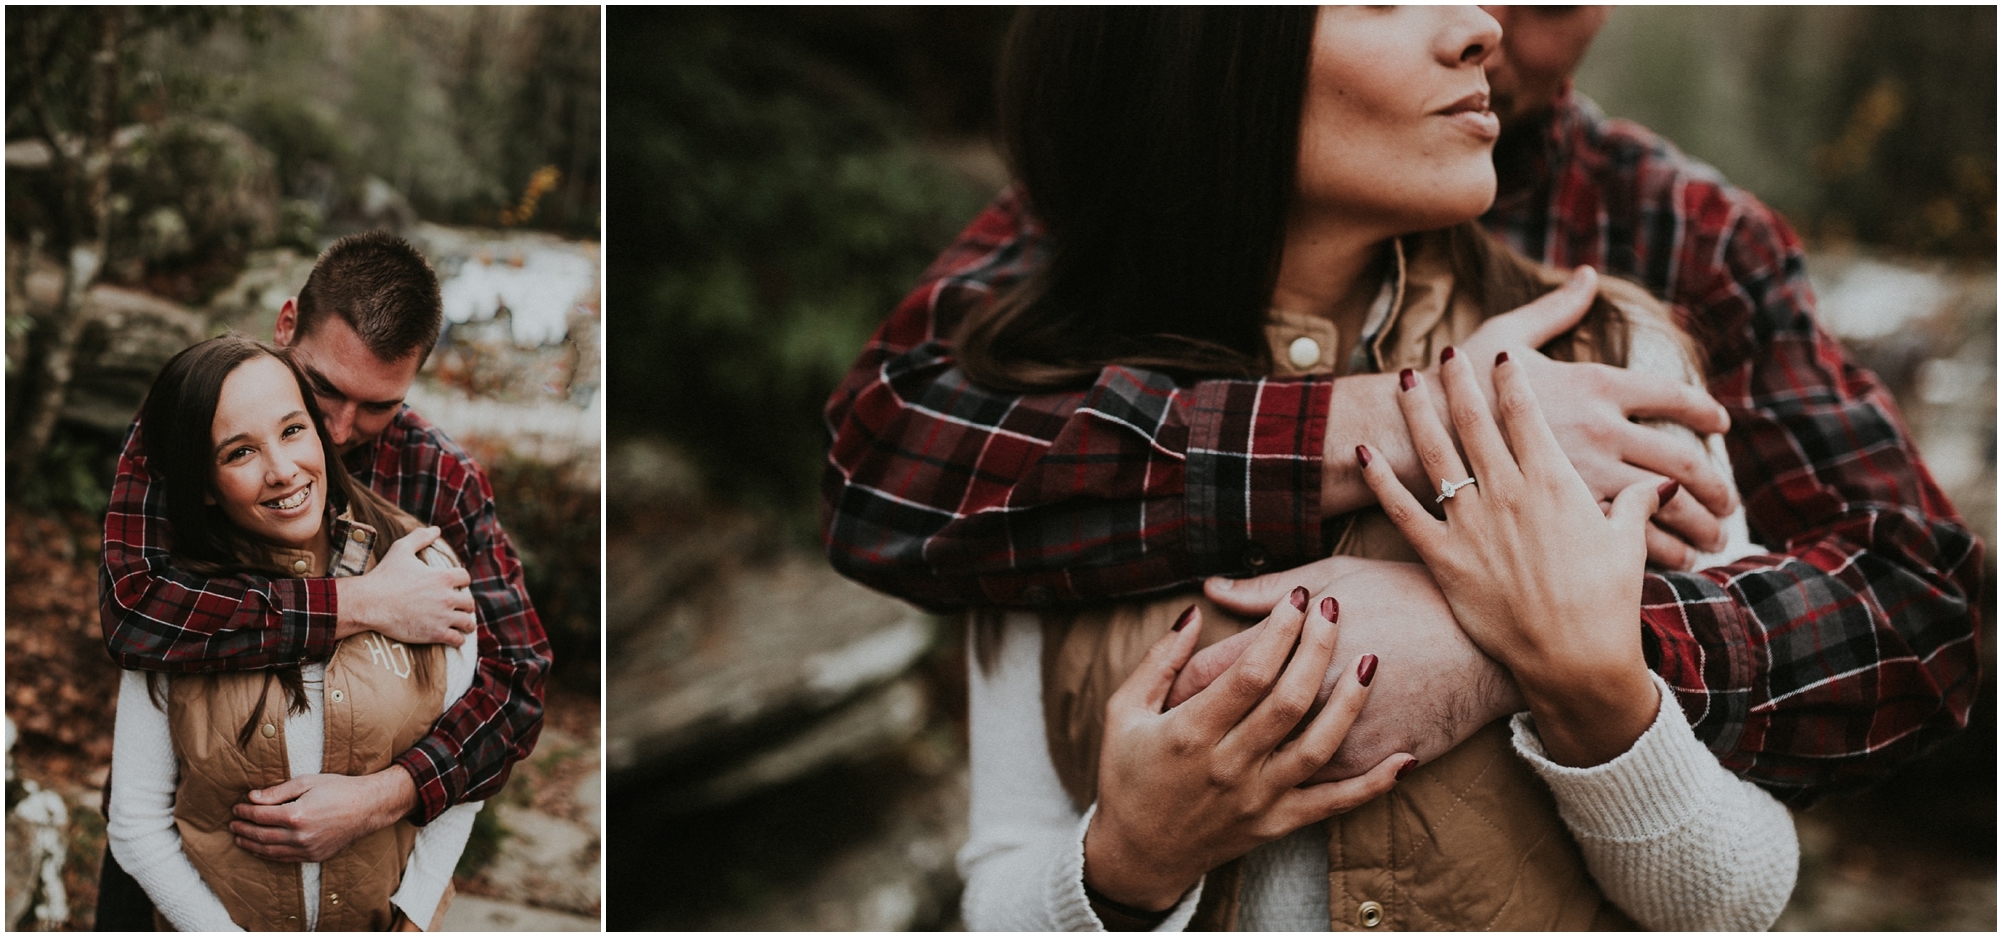 Linville-Falls-Engagement-avonne-Photography-48.jpg